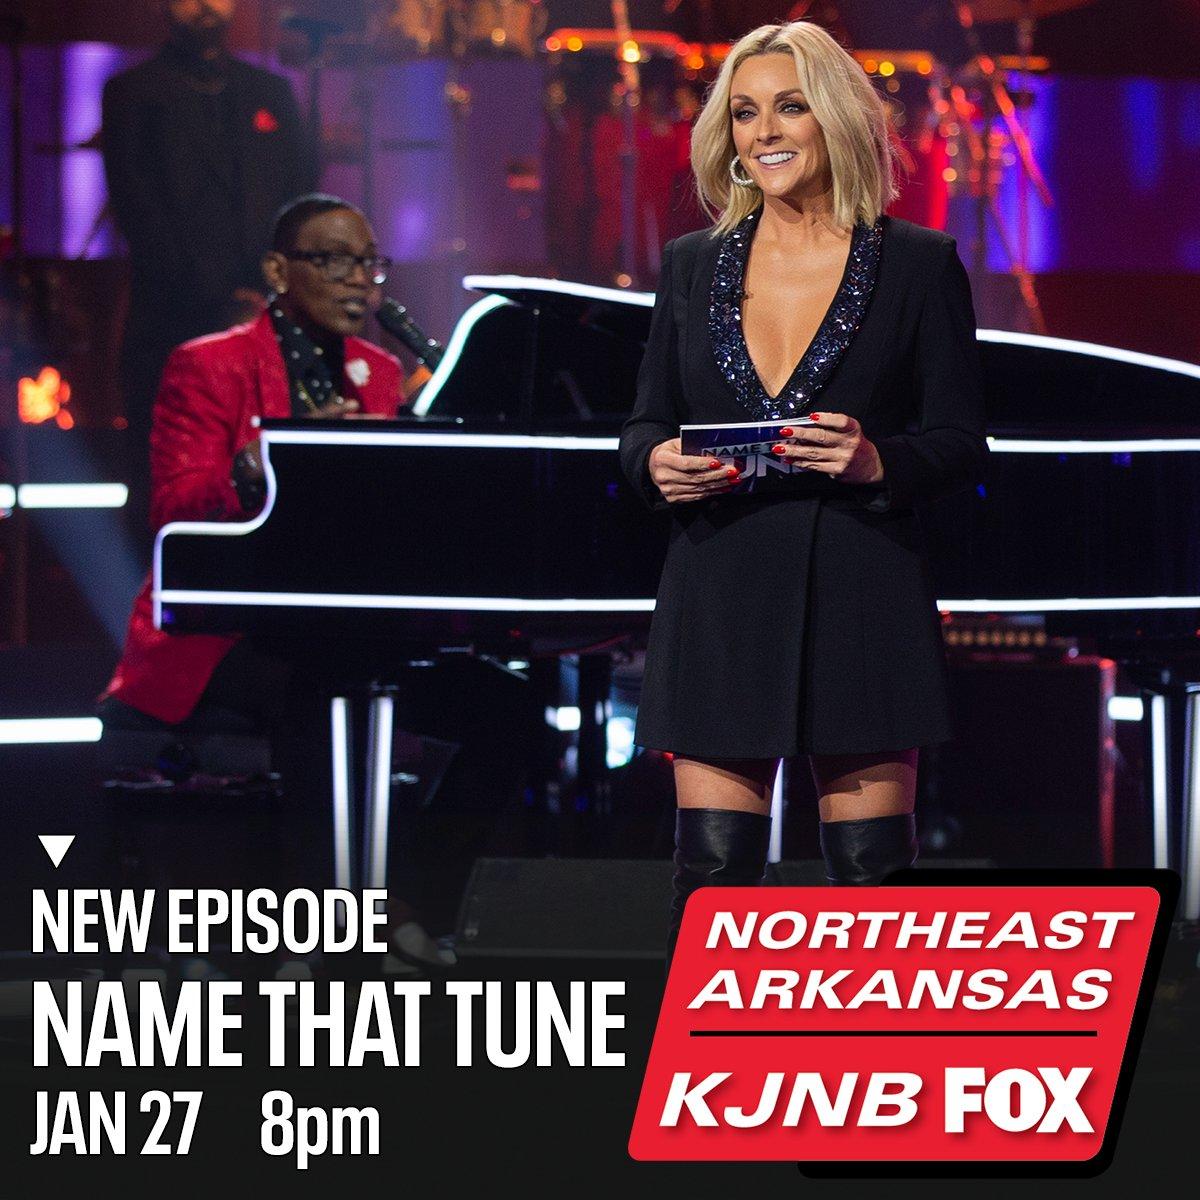 Make a note to catch Bid-A-Note on a new episode of #NameThatTune with #RandyJackson and #JaneKrakowski -- tonight at 8 on KJNB Northeast Arkansas FOX.